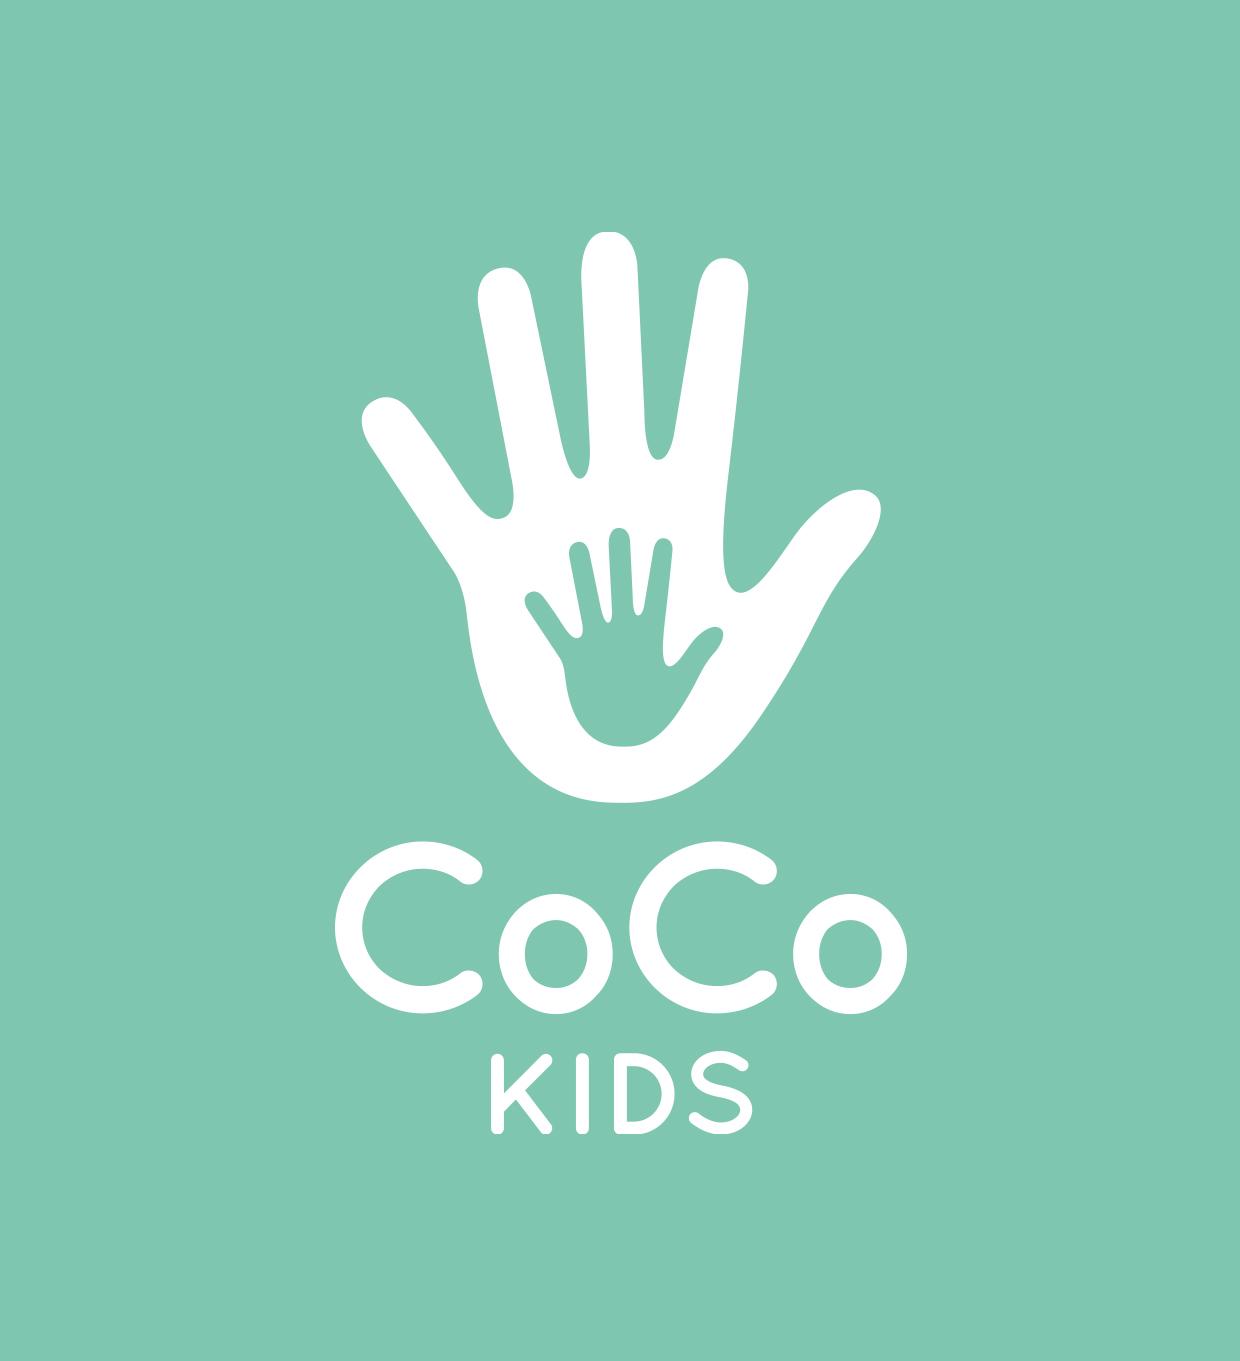 cocokids_logo_gruen